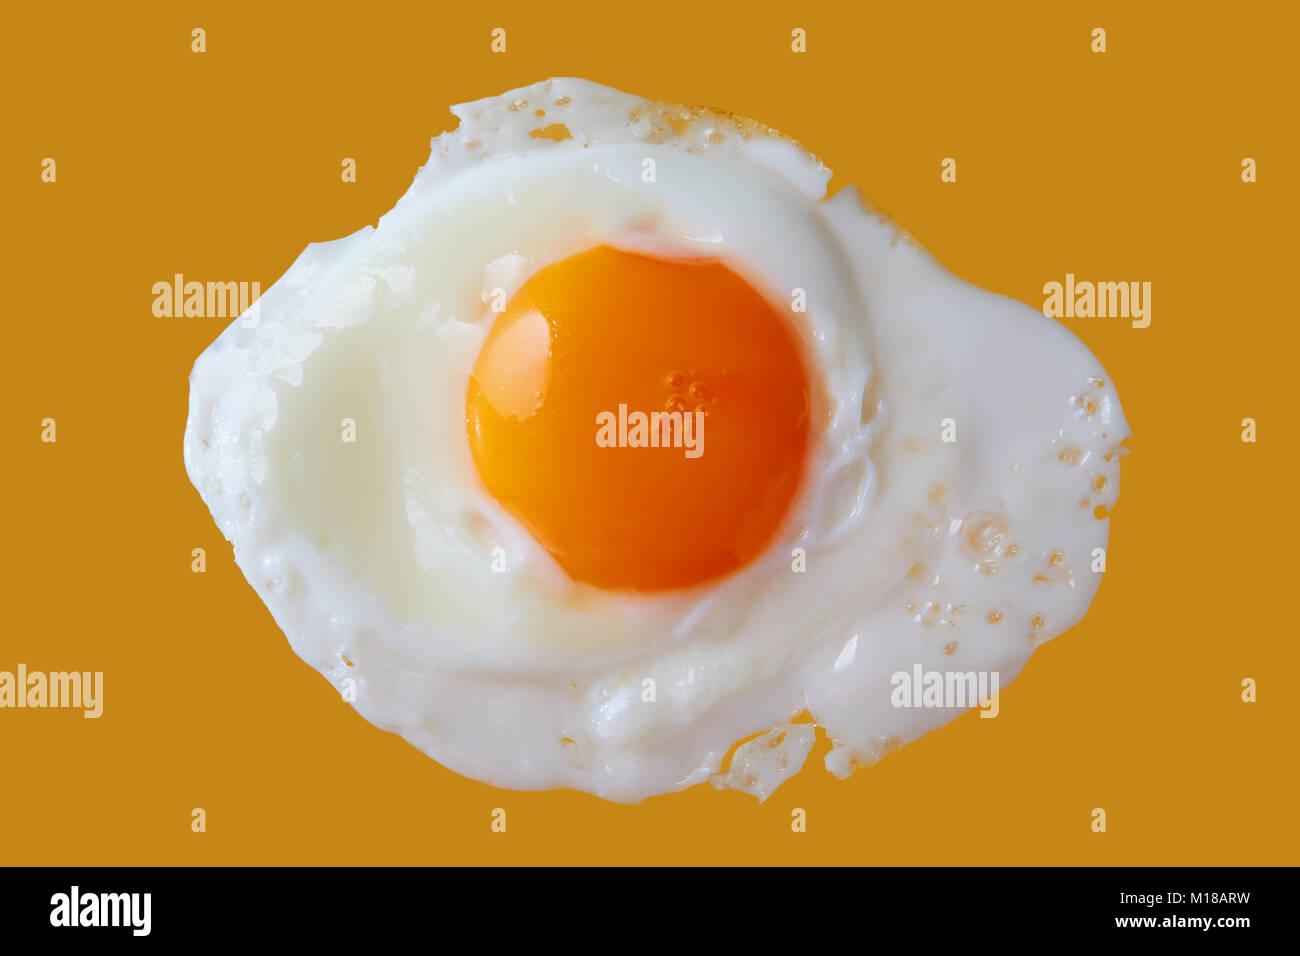 Fried egg on yellow background, close up - Stock Image